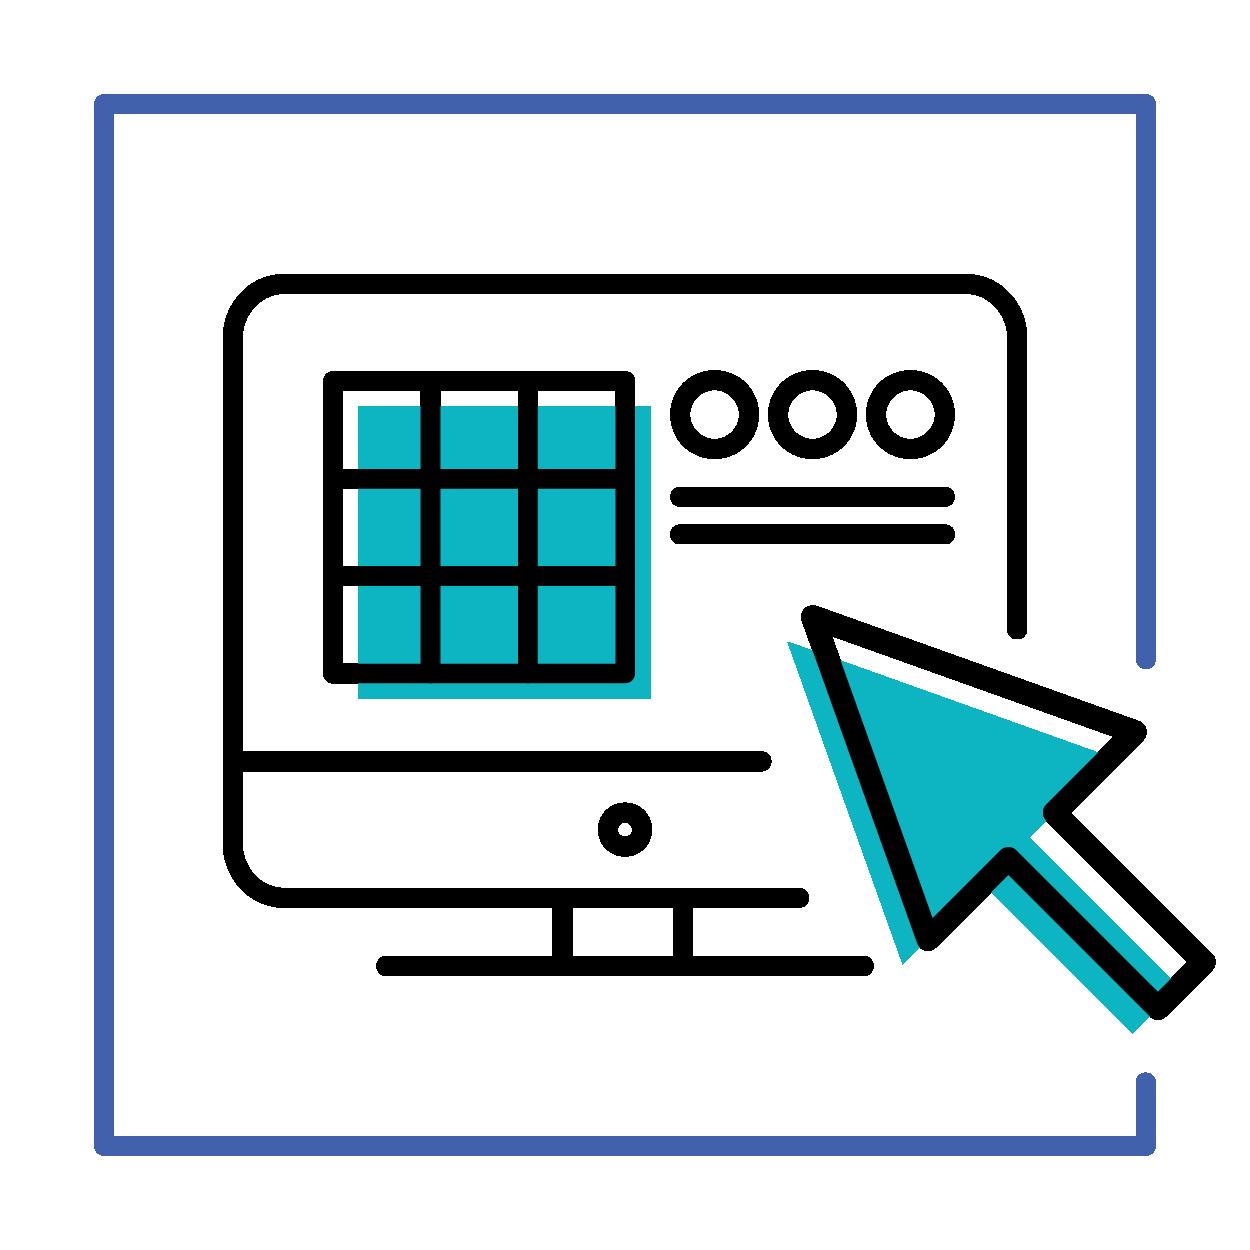 process-icons_Artboard 1.png